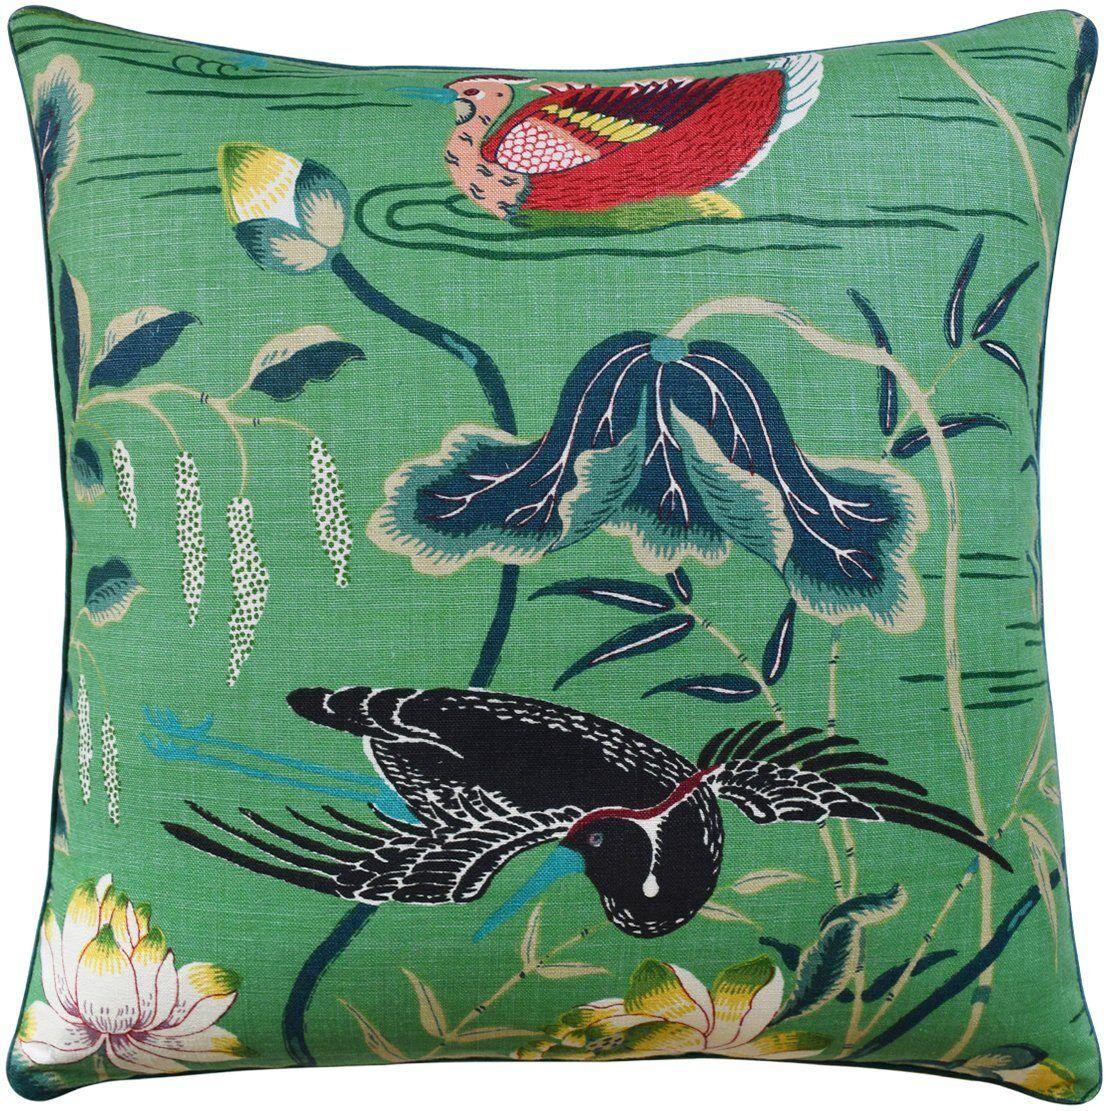 Ryan Studio Lotus Garden Jade Pillow